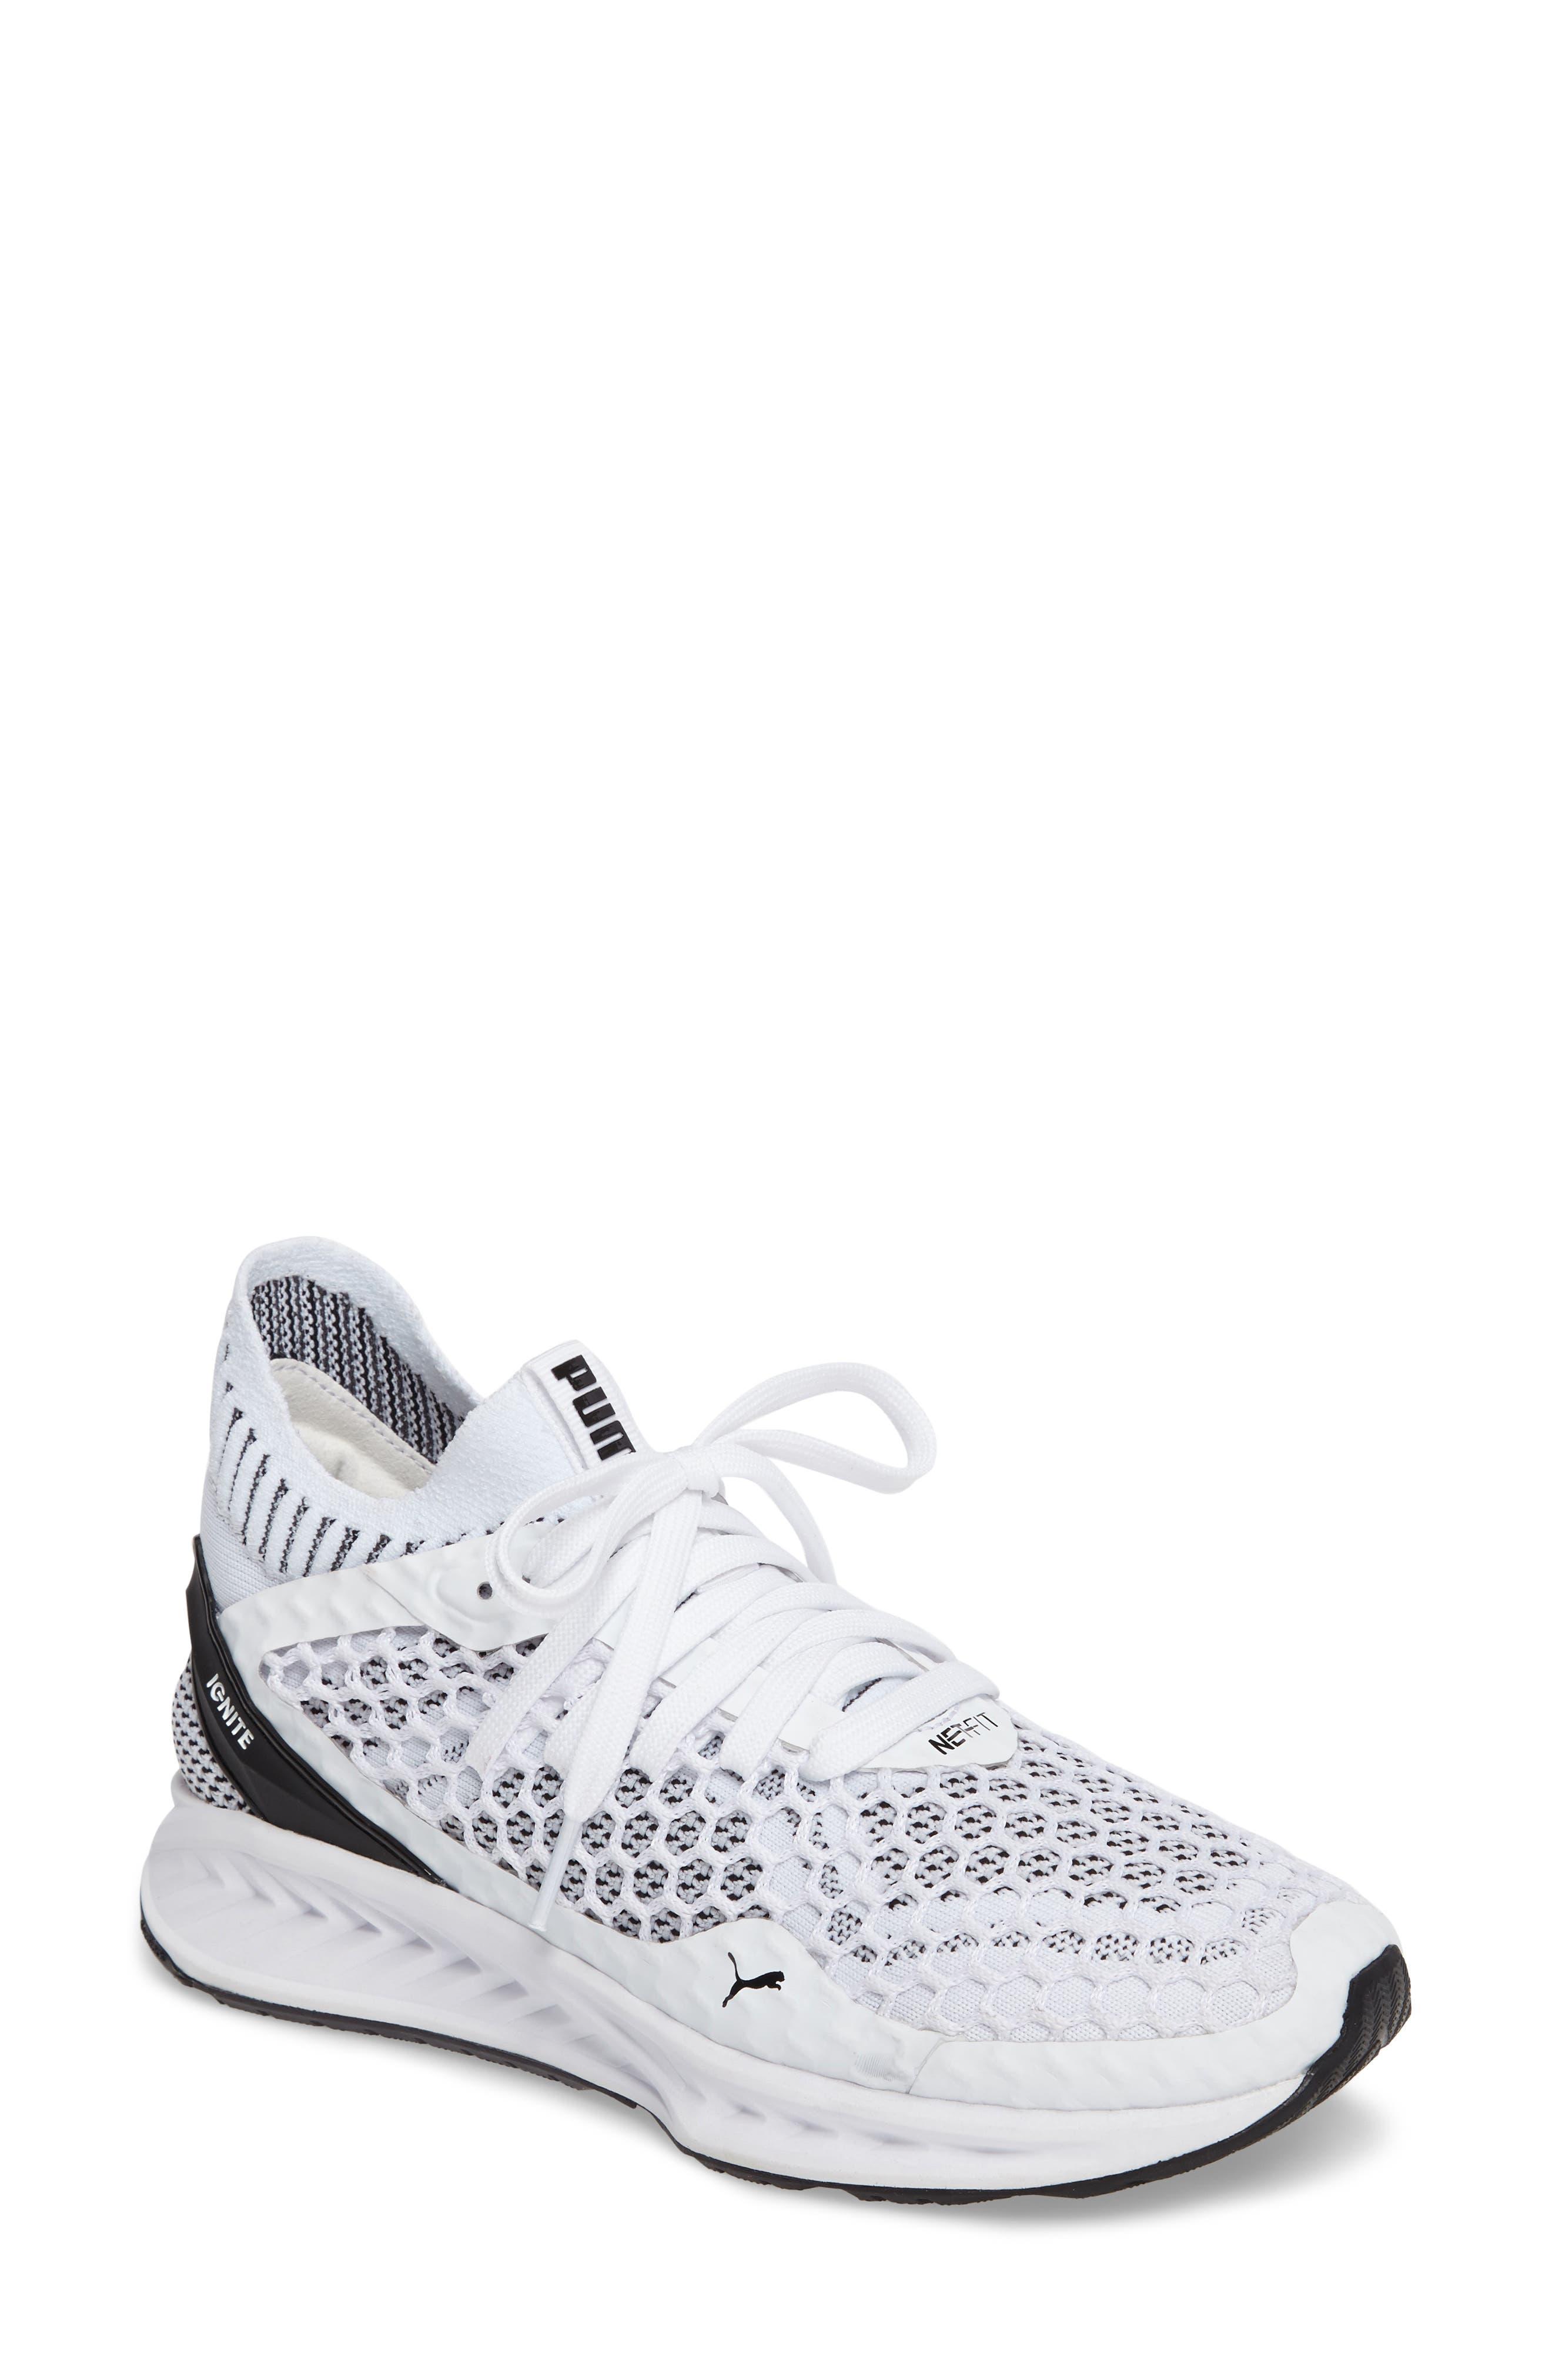 IGNITE evoKNIT Running Shoe,                         Main,                         color, White/ Black